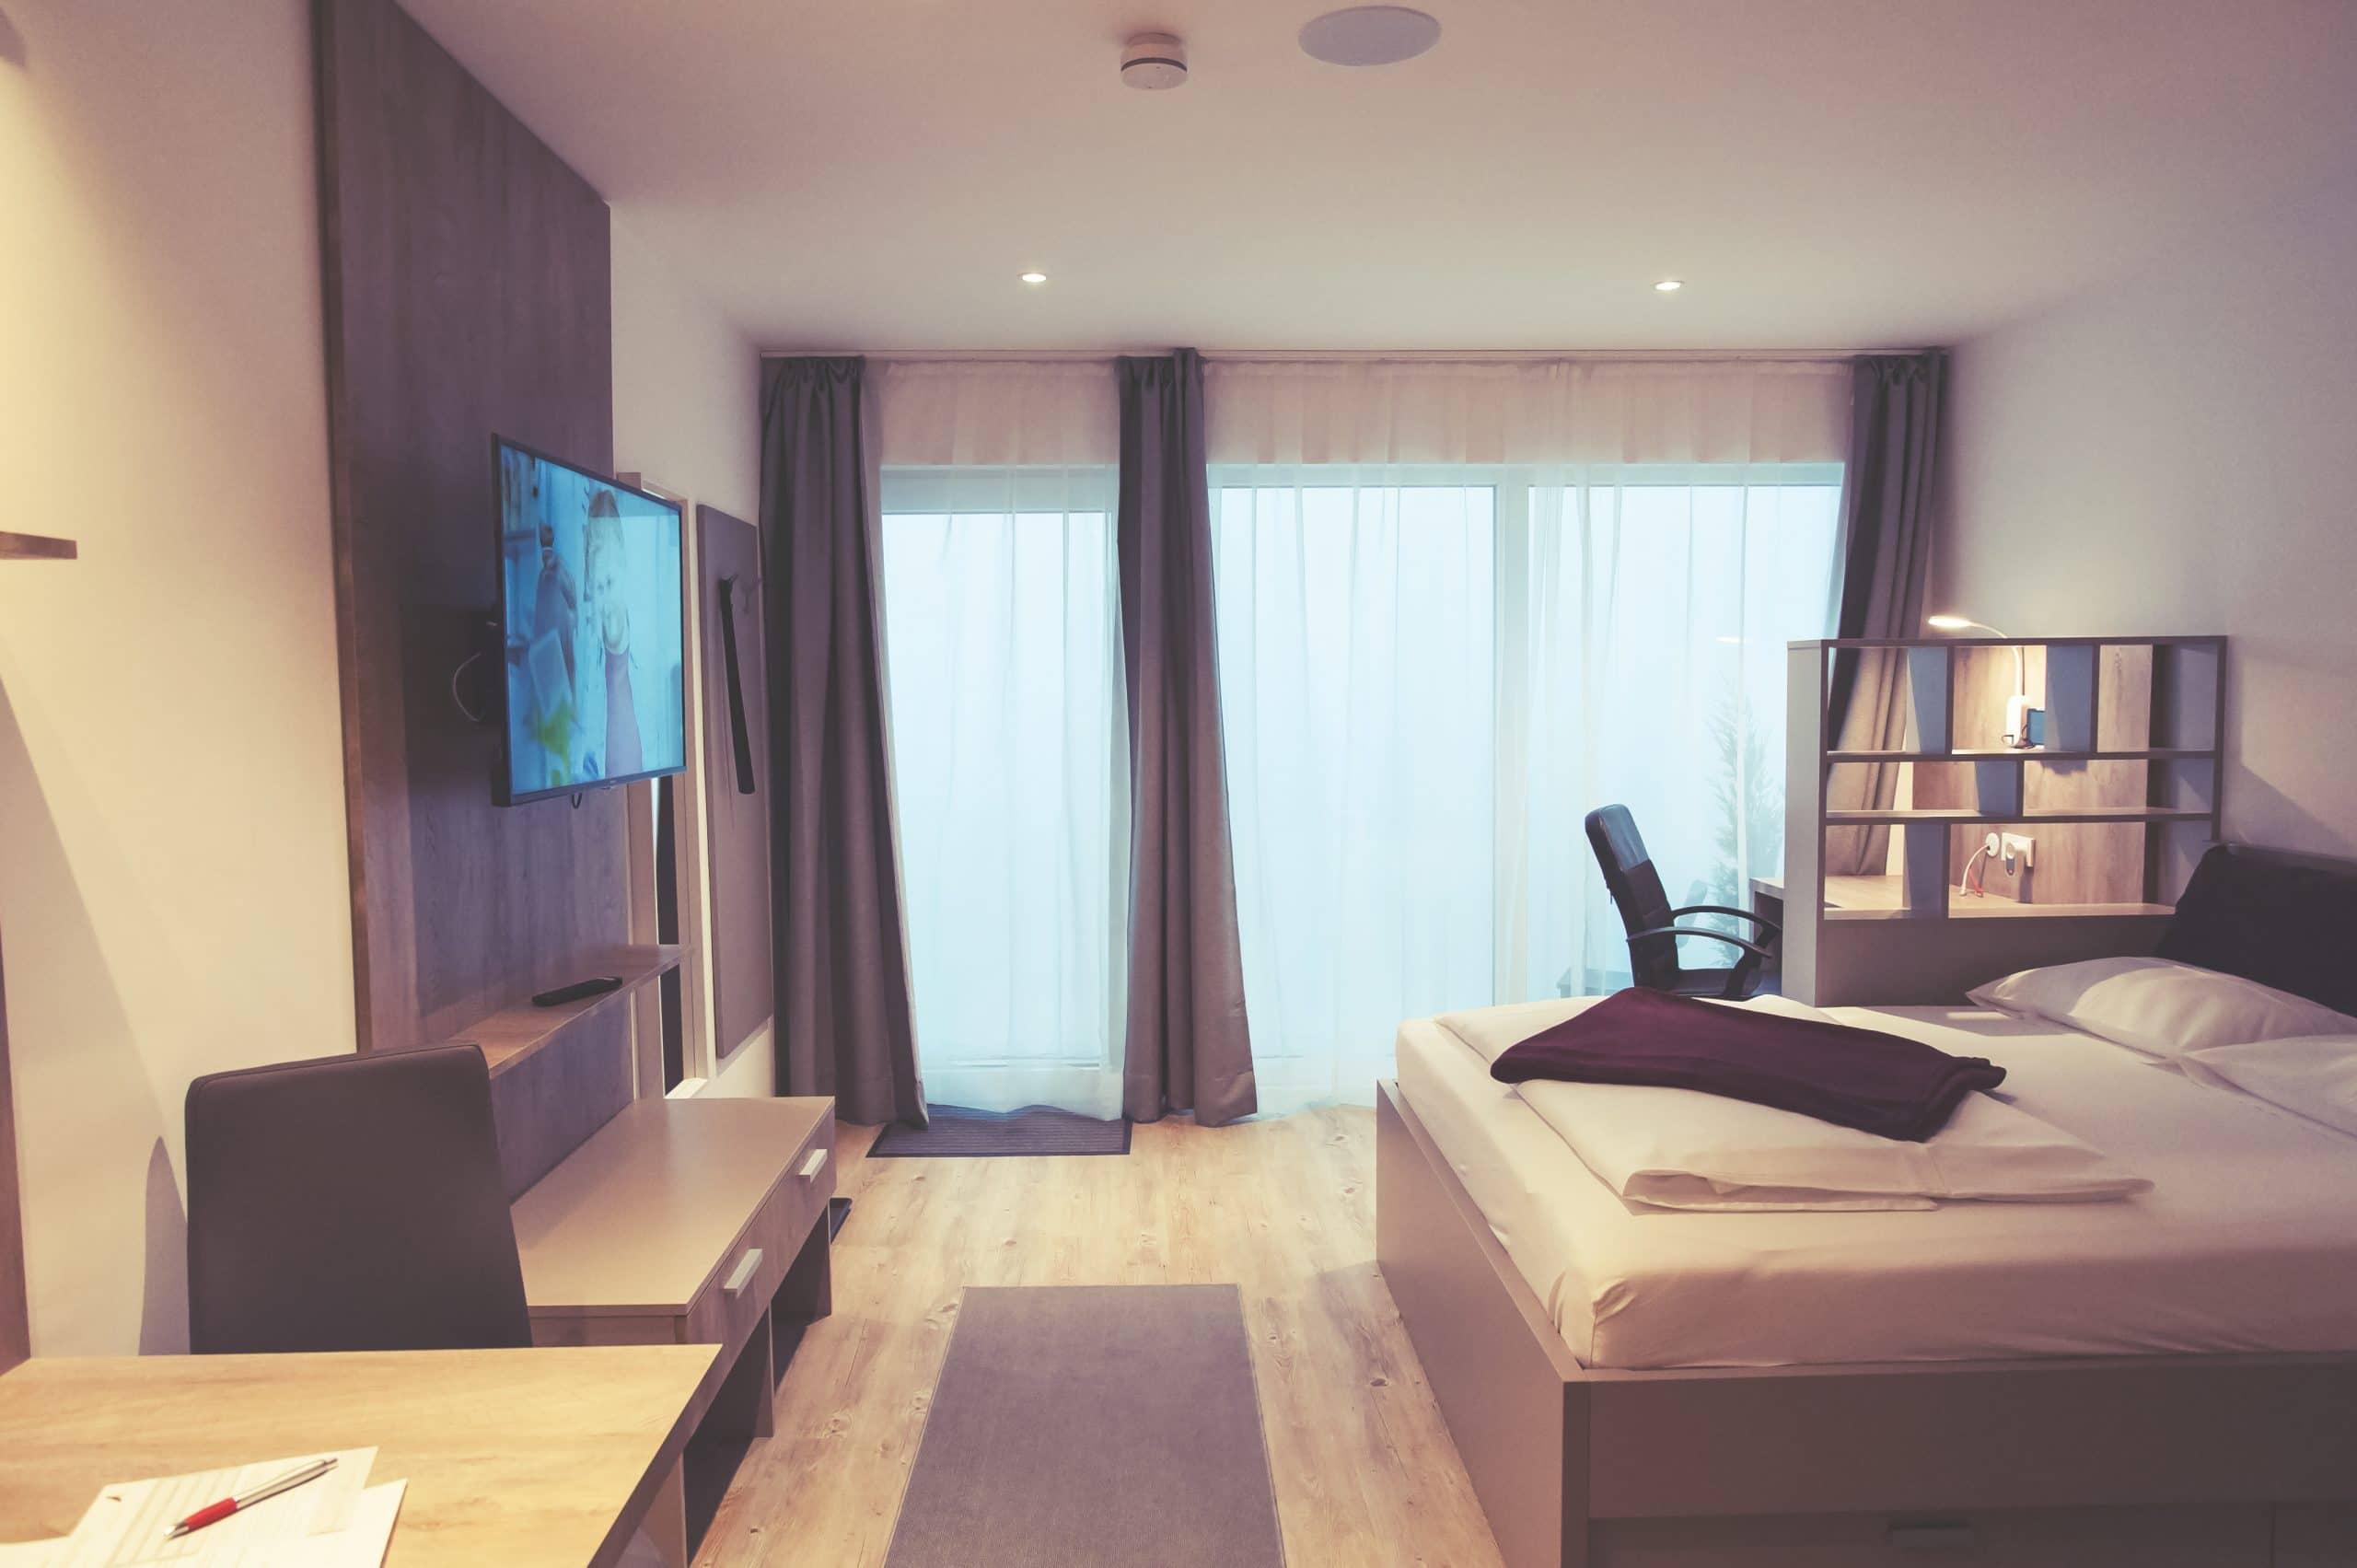 Vesalius_Appartement_4